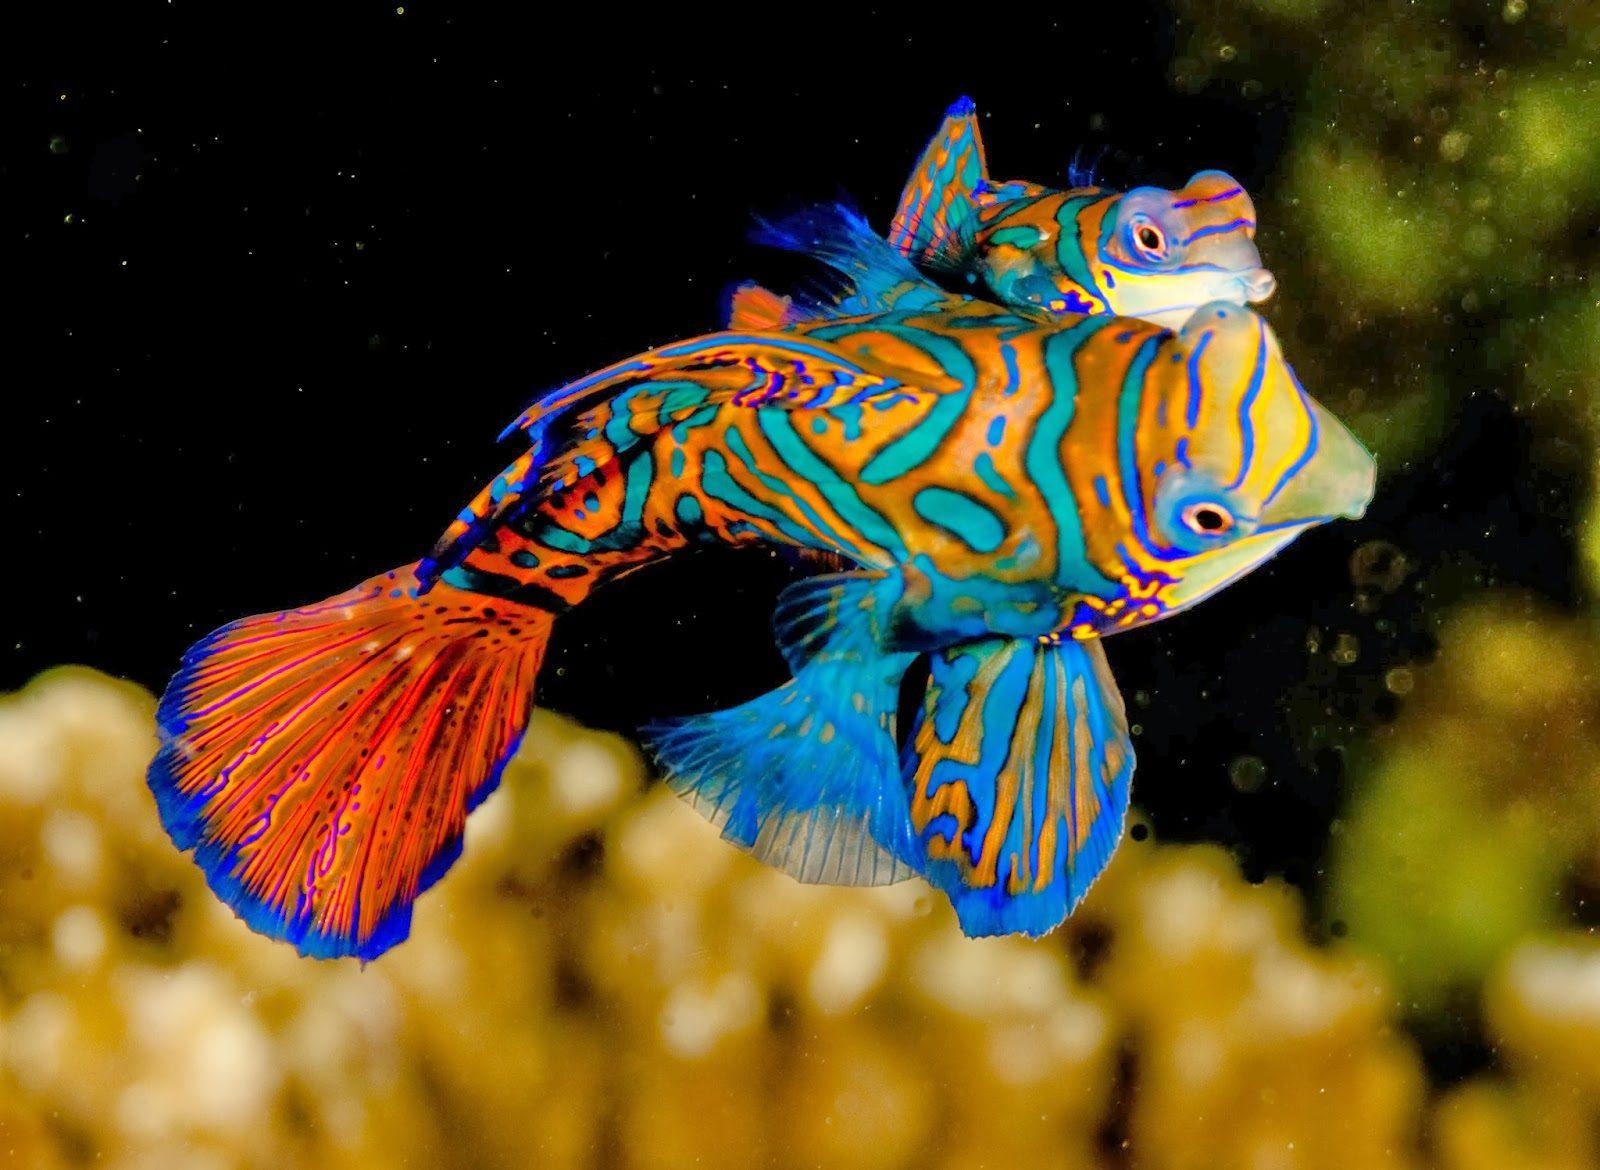 Mandarinfish..-e1597423755875 Top 10 Most Beautiful Colorful Fish Types